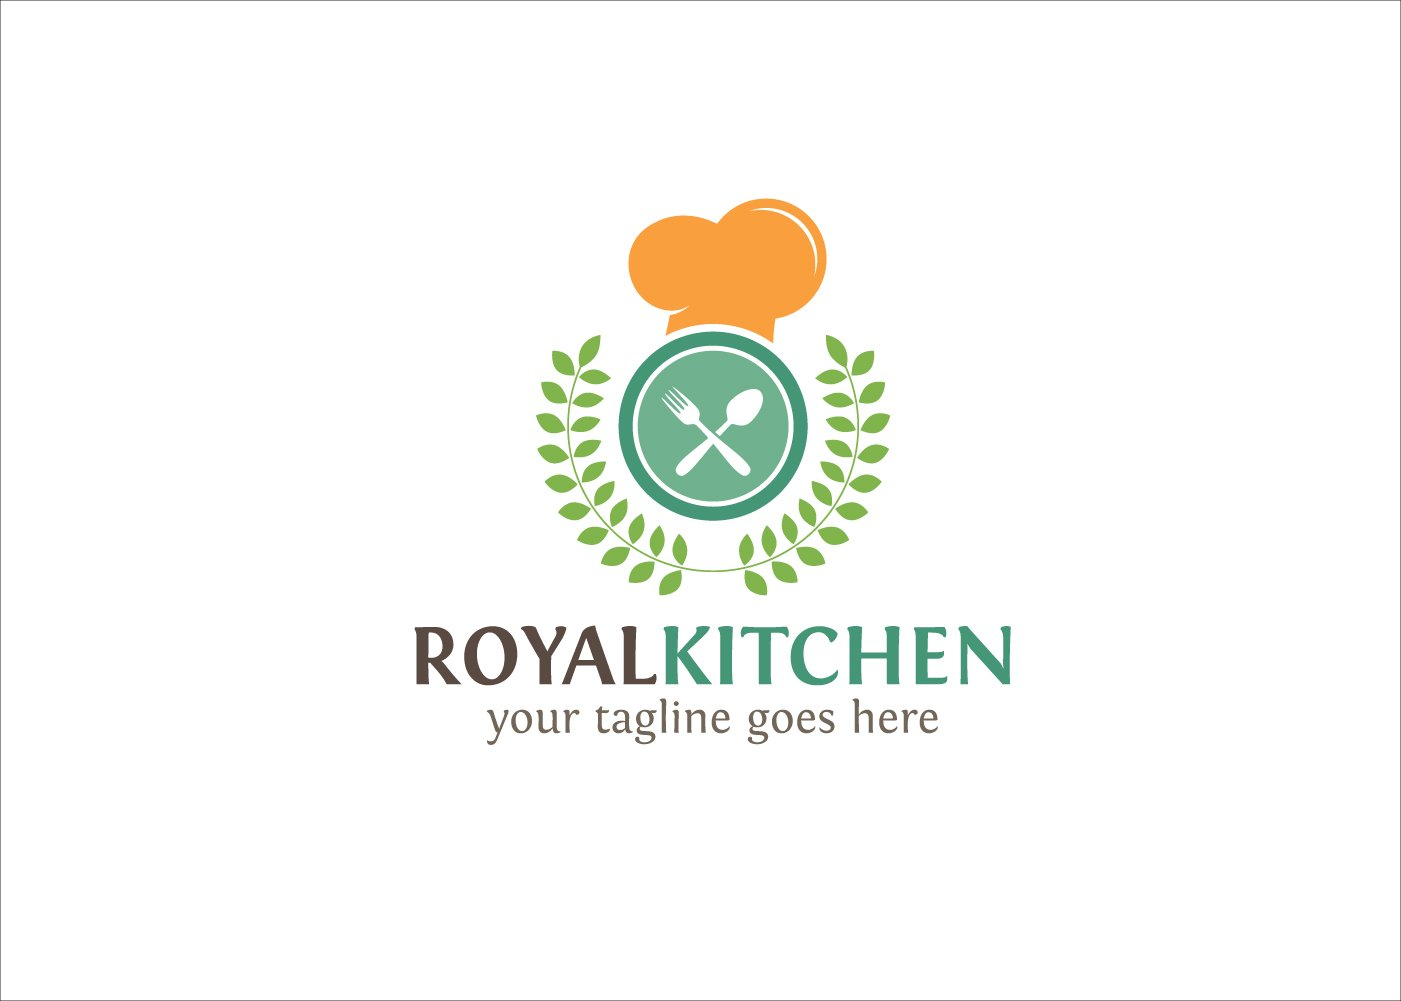 royal kitchen logo logo templates creative market - Kitchen Logo